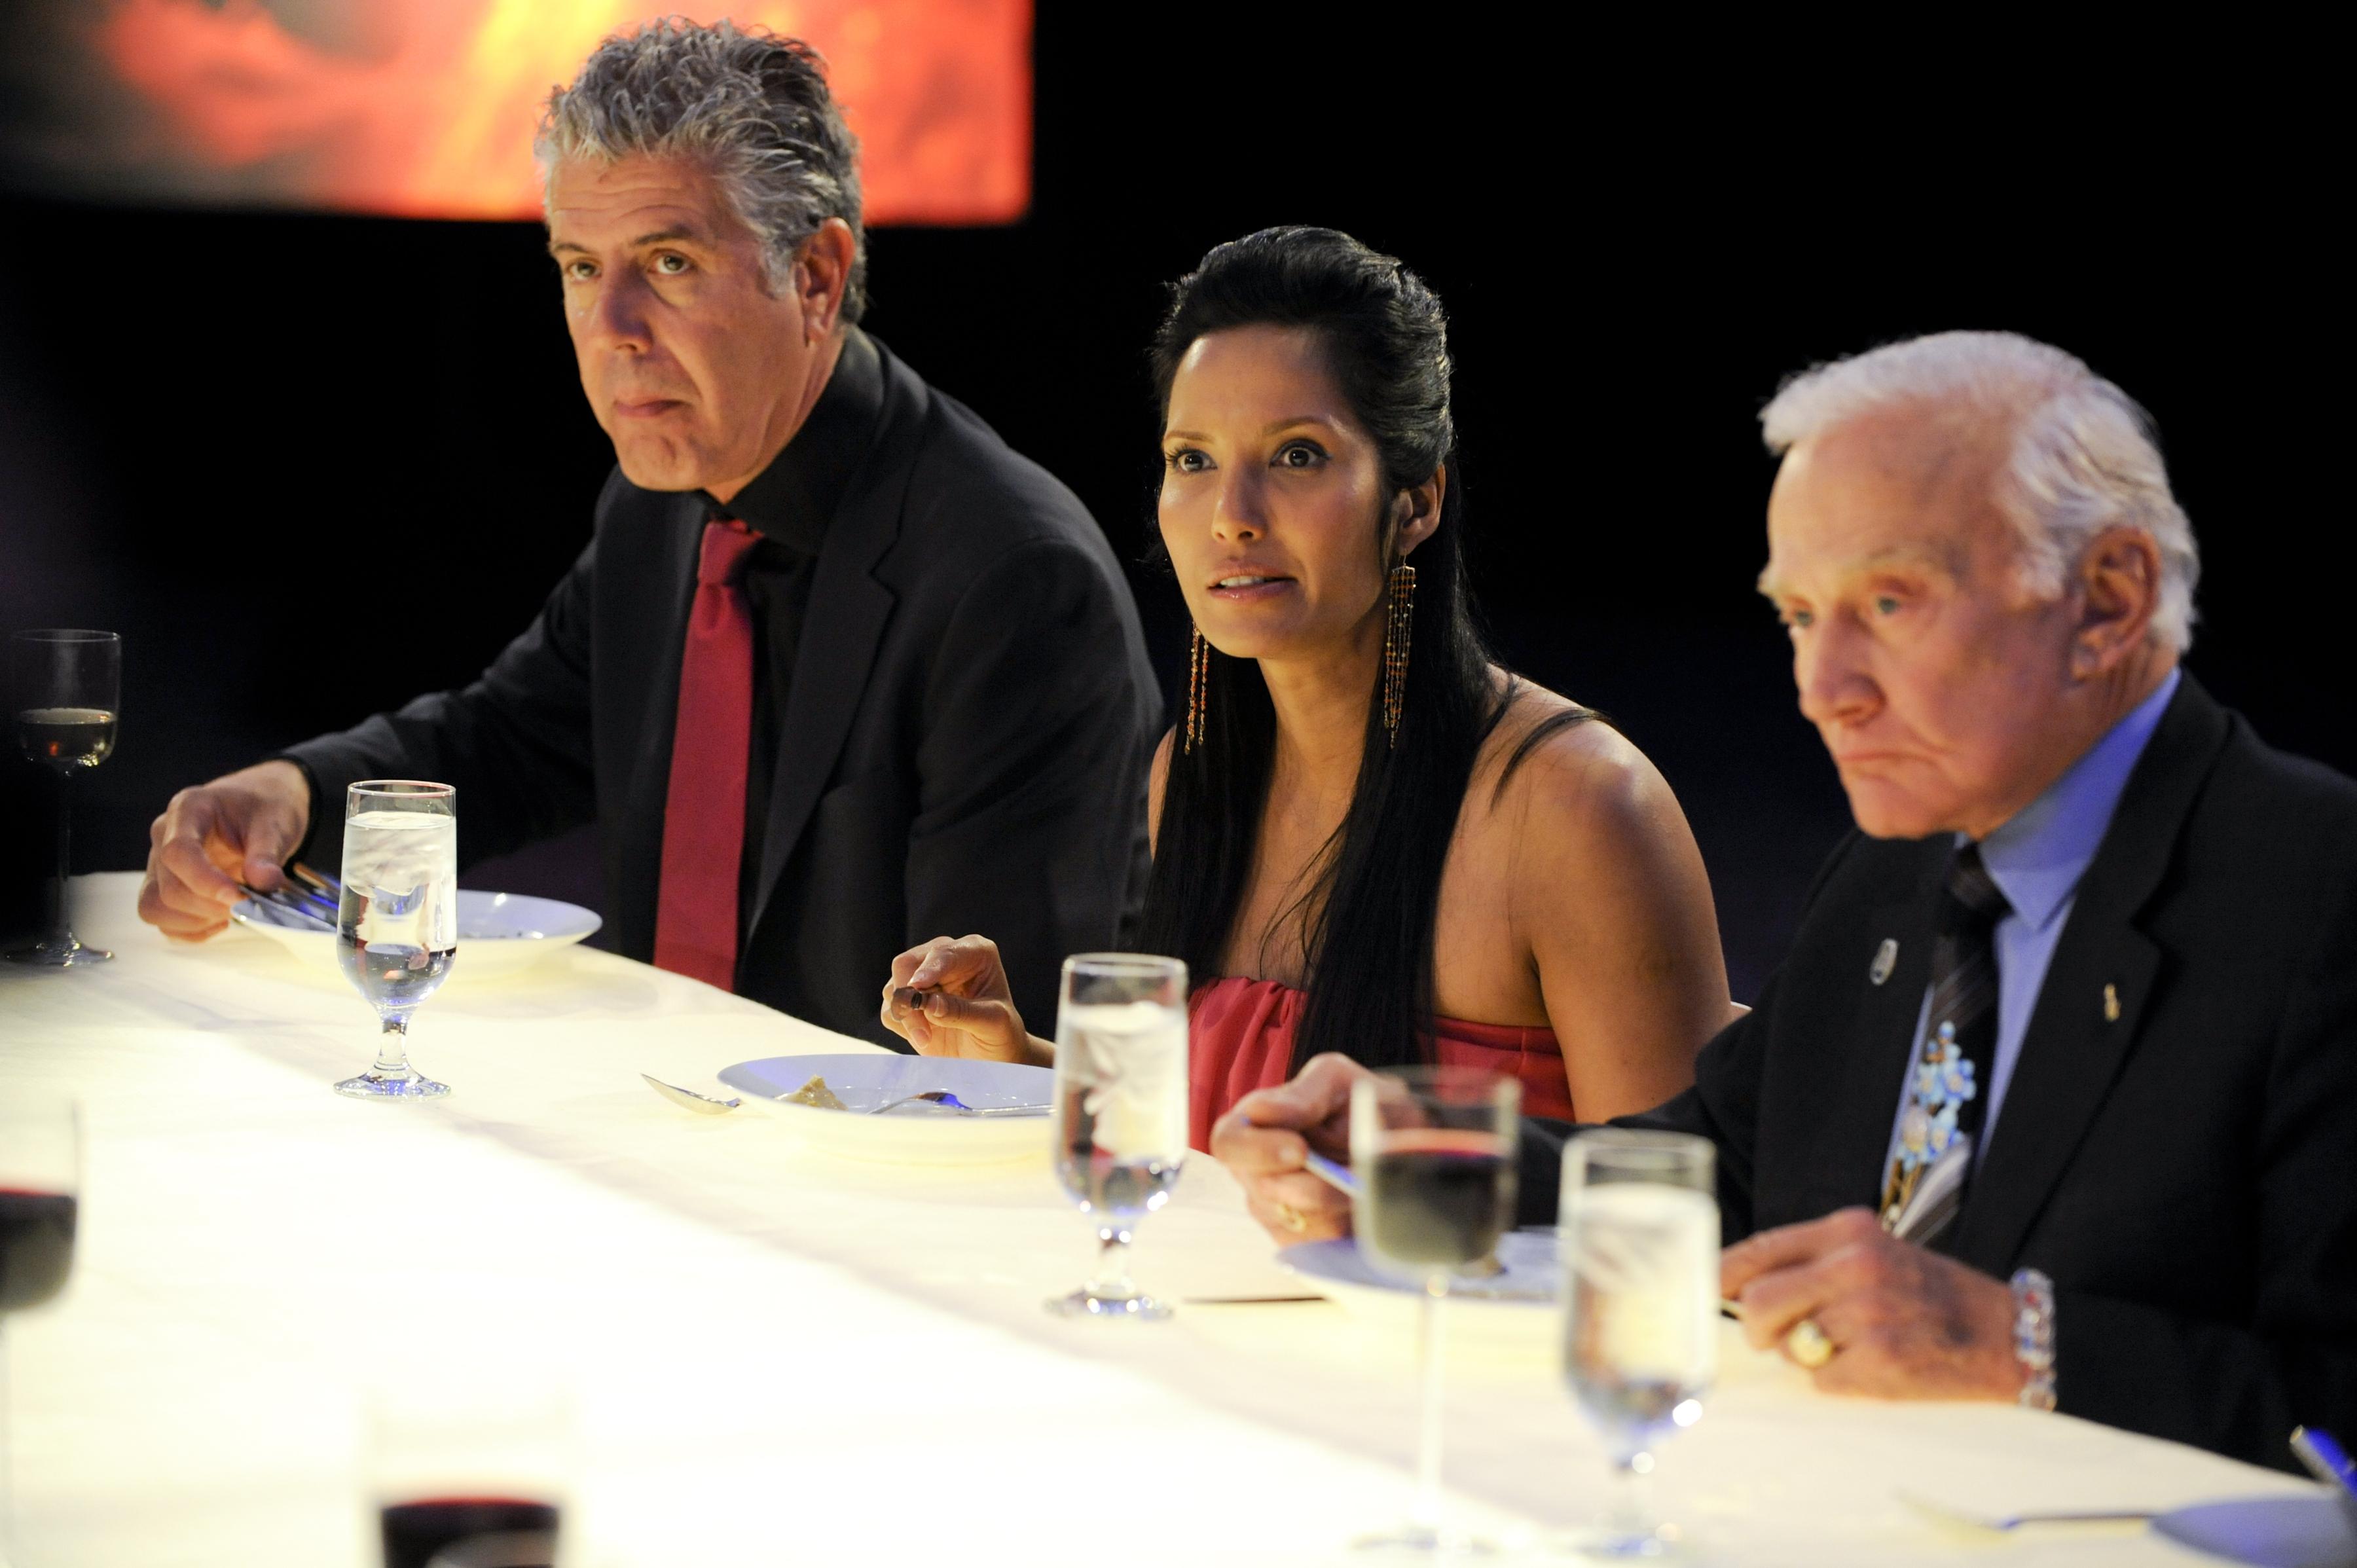 nasa nasa presents challenge to top chef contestants